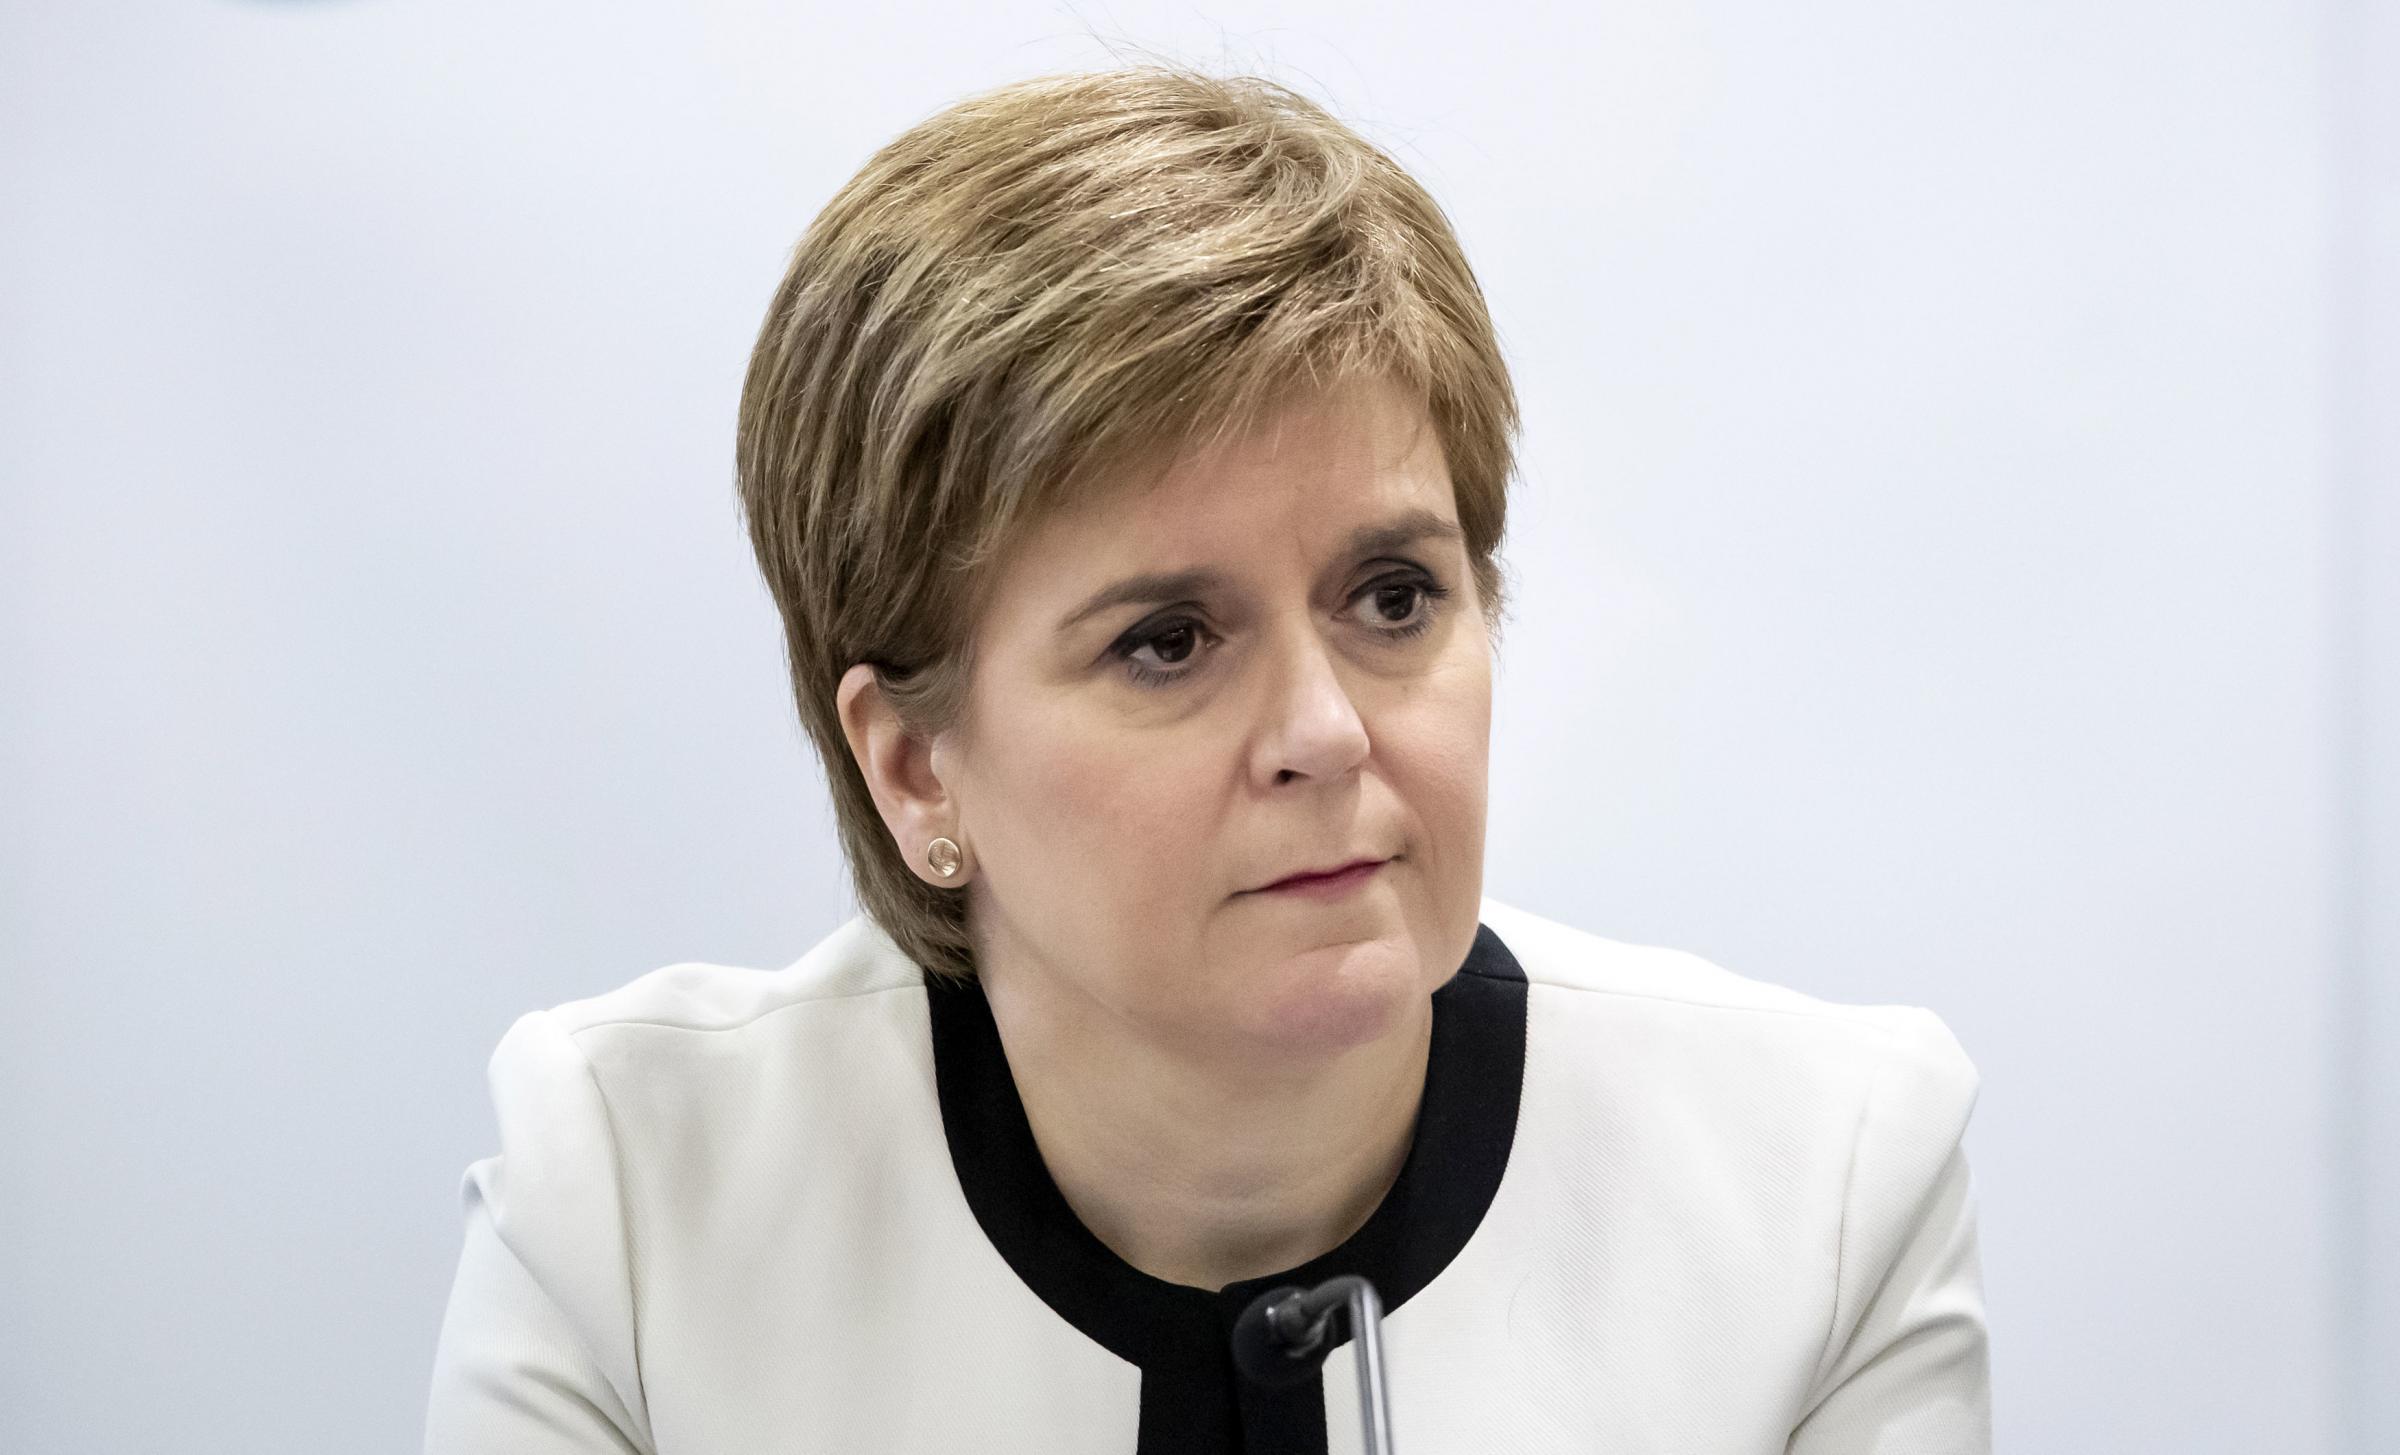 Nicola Sturgeon responds to suspension of Tory over miscarriage 'joke'